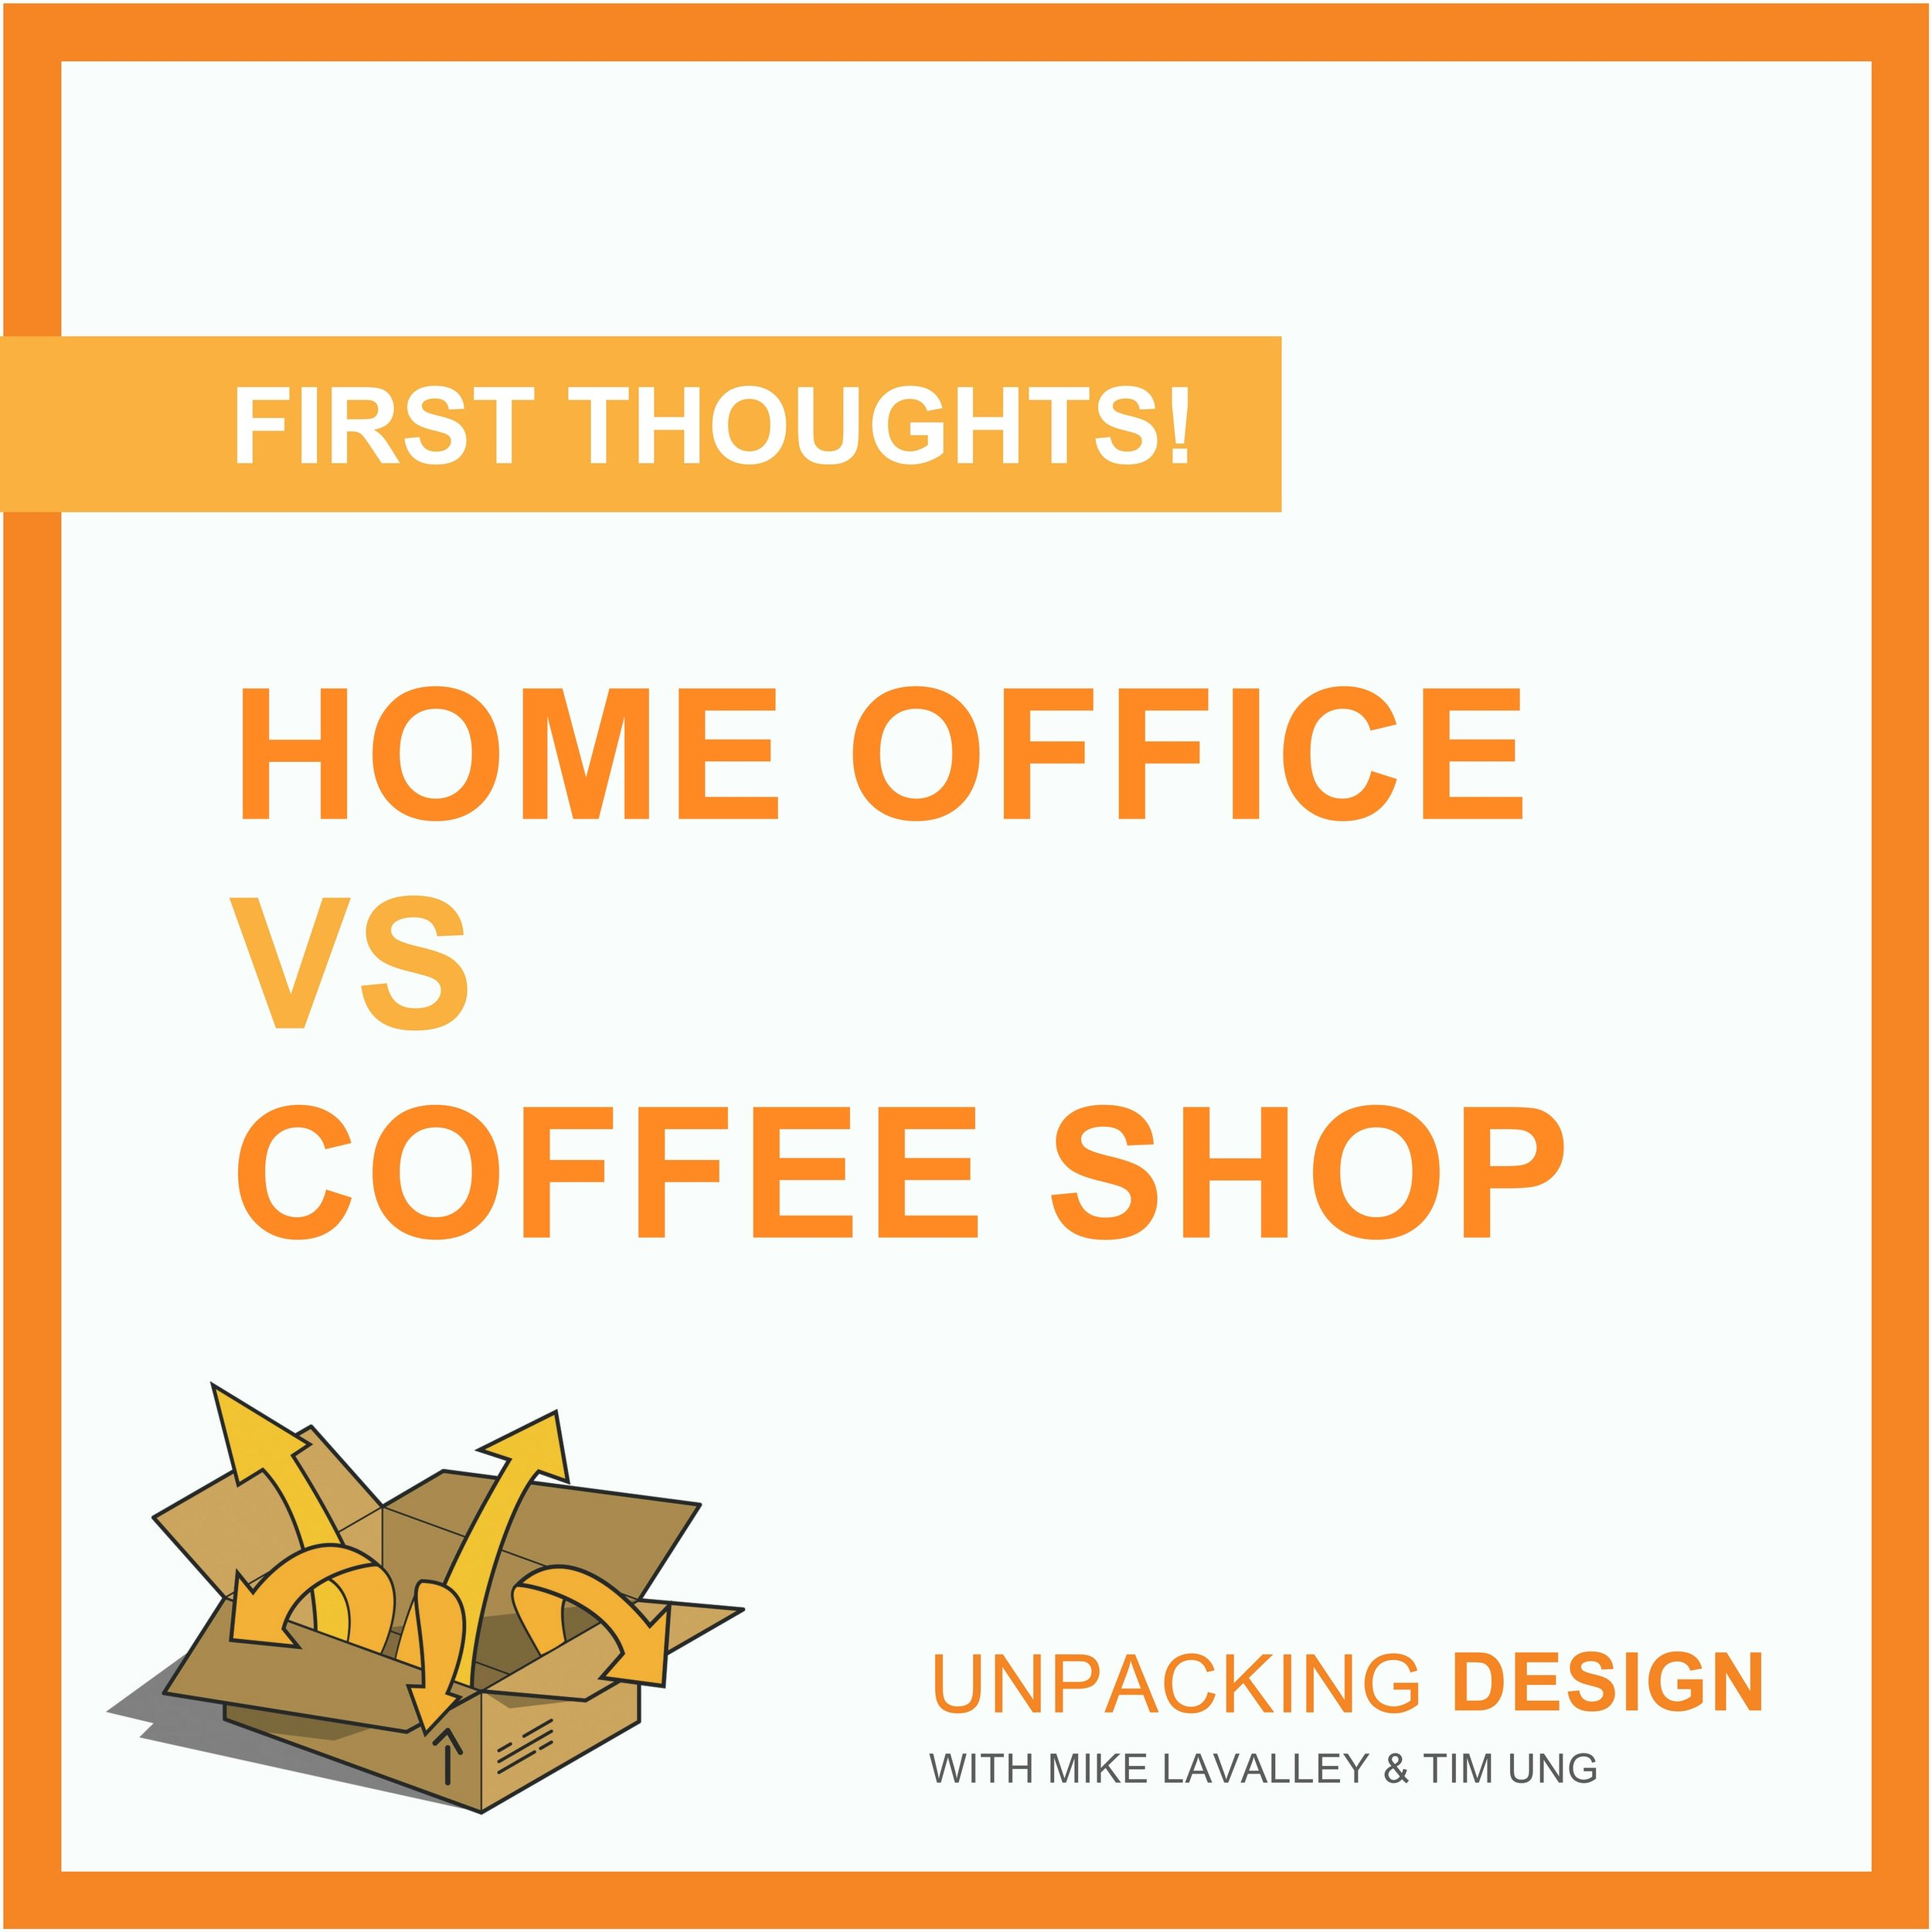 FT - Episode 05 - Home Office vs Coffee Shop.jpg